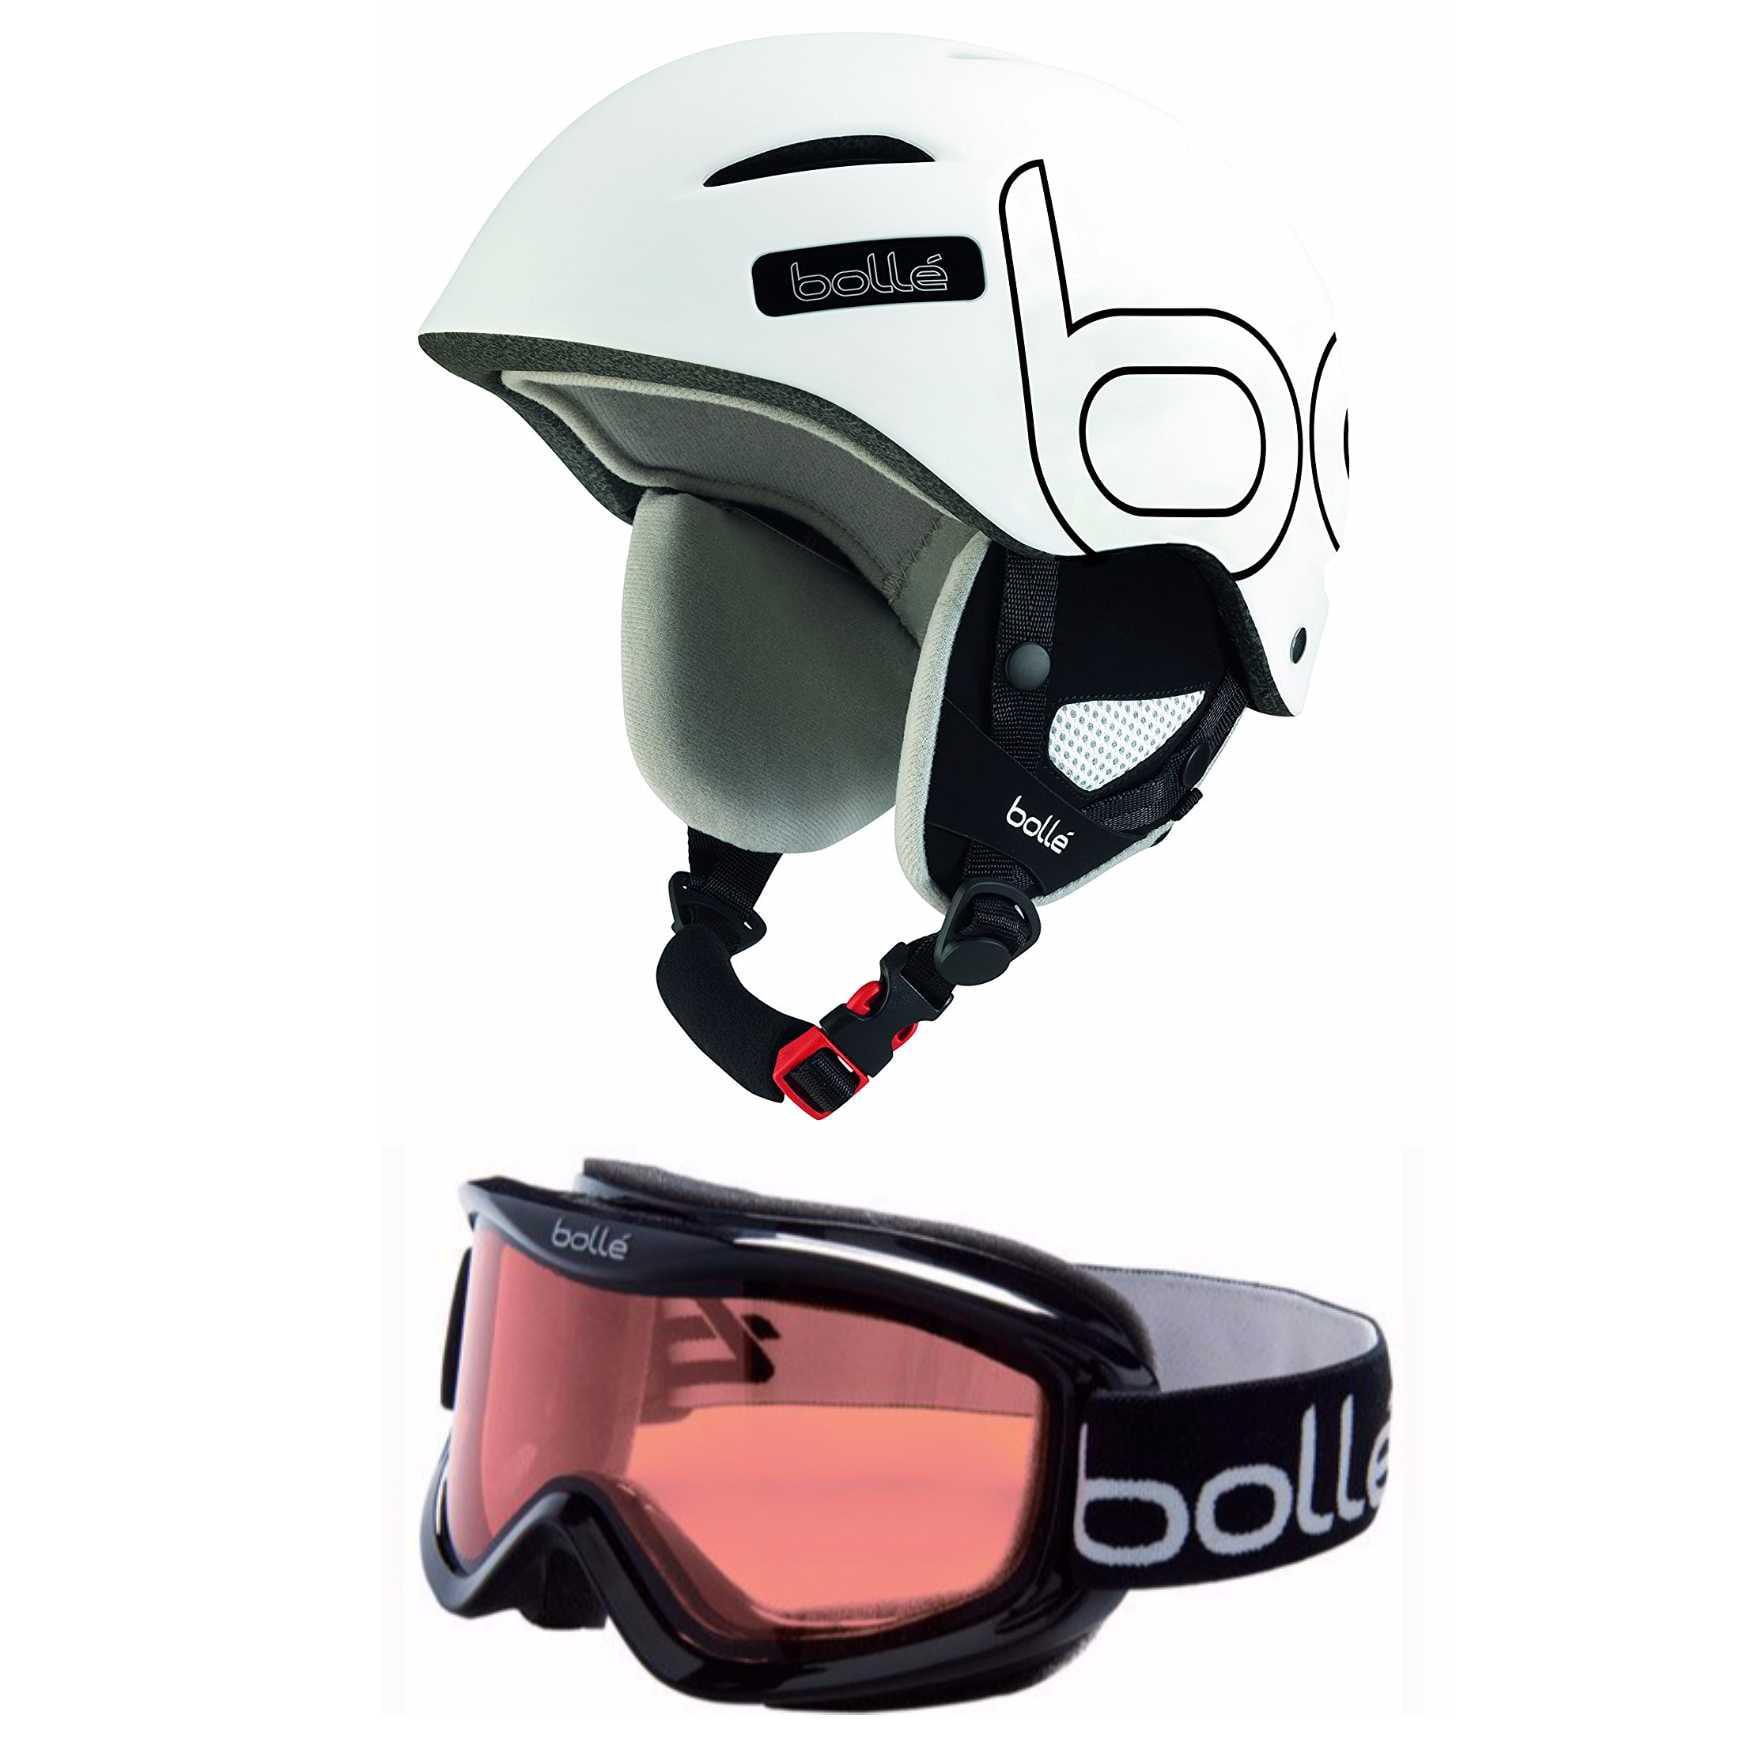 Bolle B-Style Ski Snow Helmet (54-58 cm, Black White) & 20571 Mojo Ski Goggles by Bolle